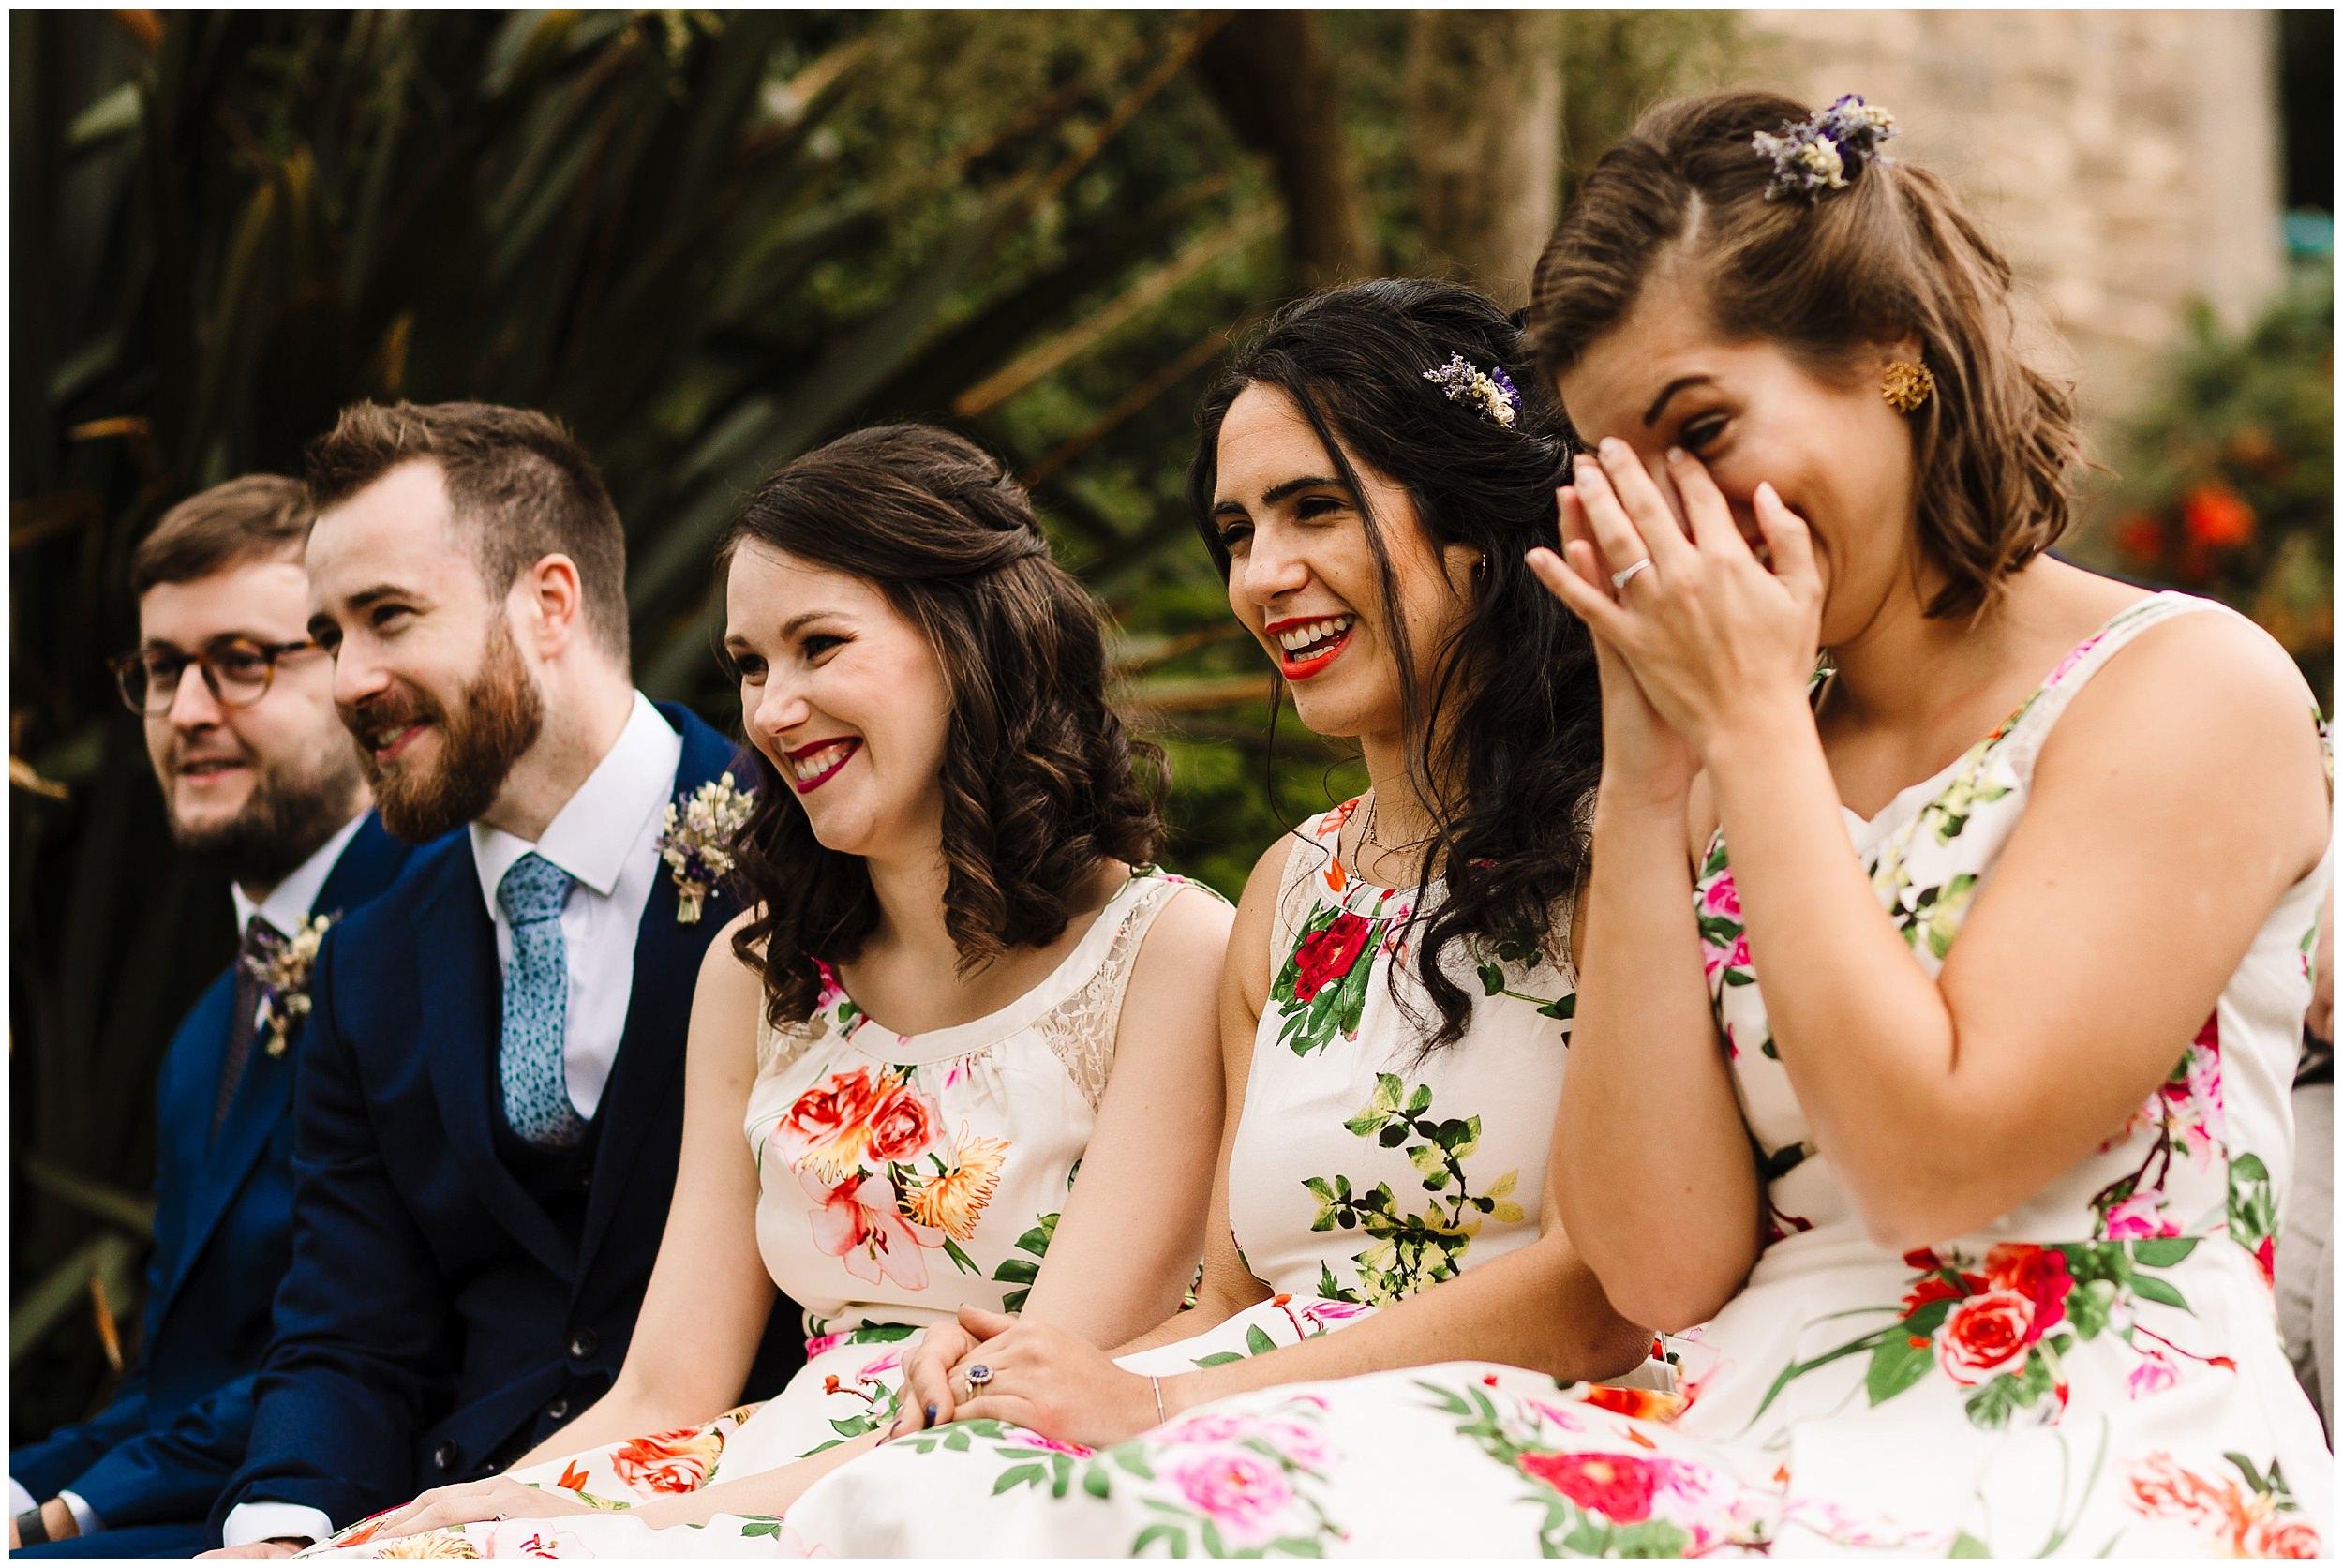 YORKSHIRE OUTDOOR WEDDING PHOTOGRAPHER LUCY ALEX_0015.jpg